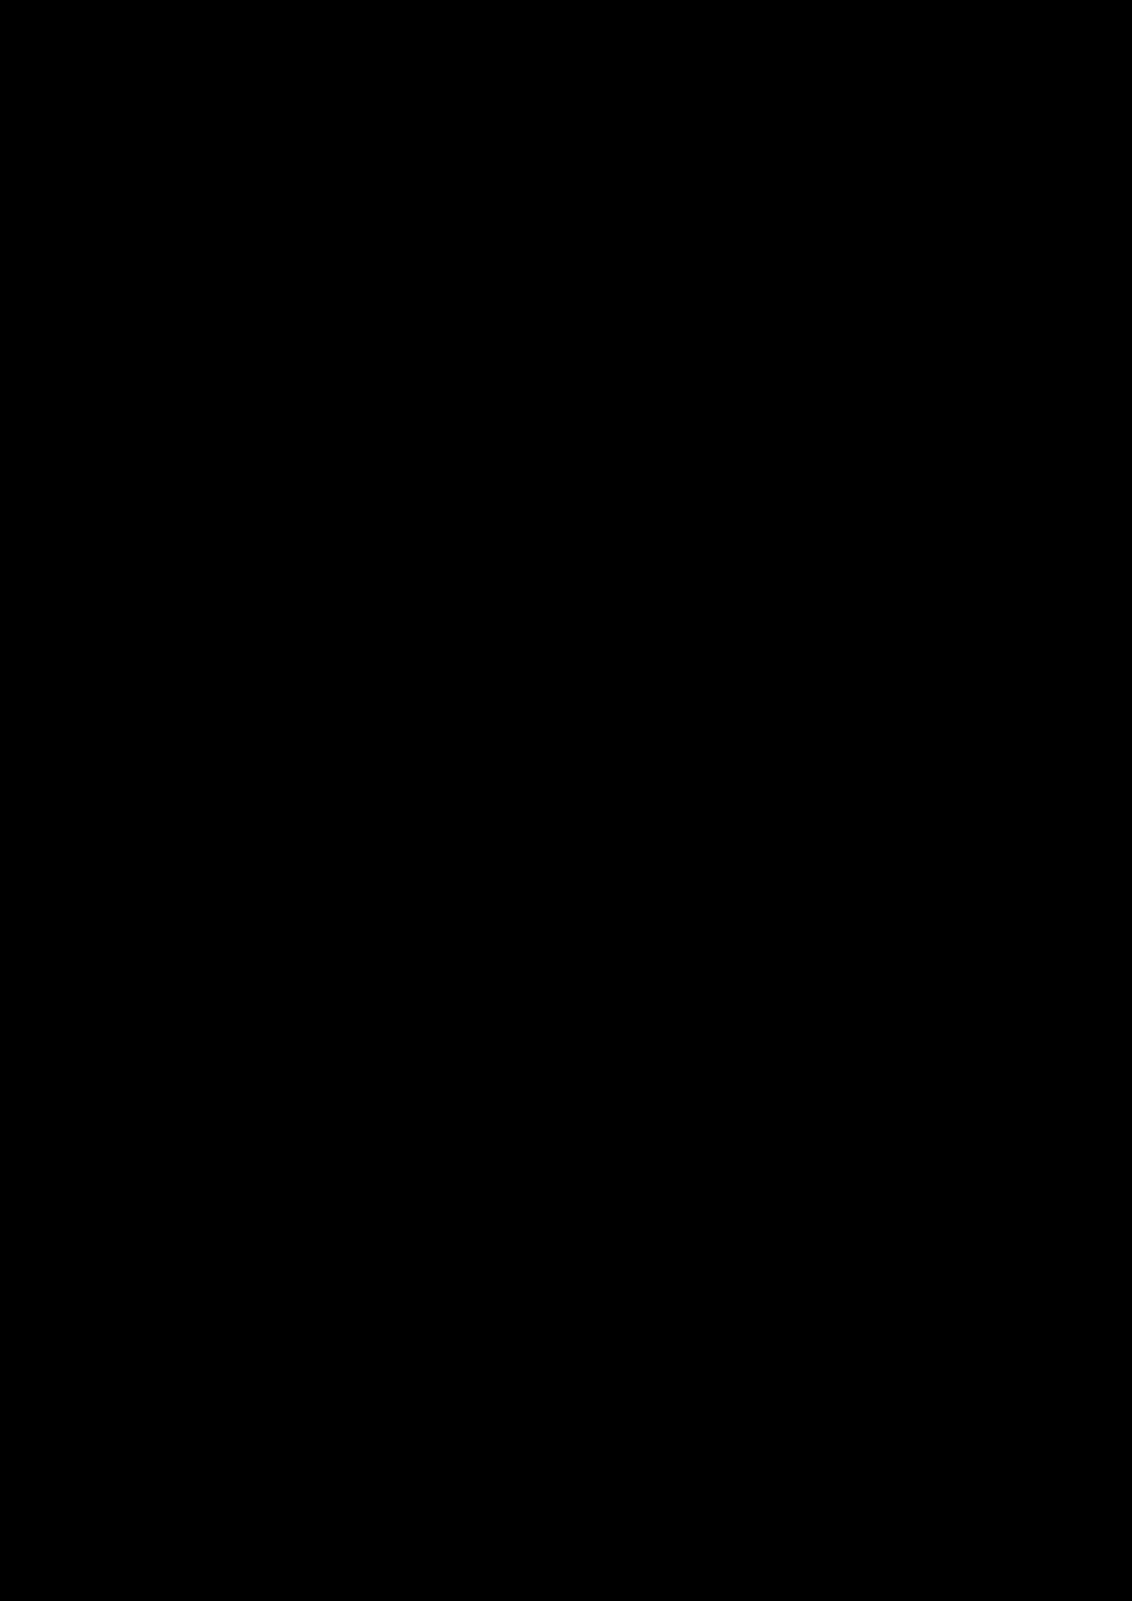 Ten lyubvi slide, Image 51